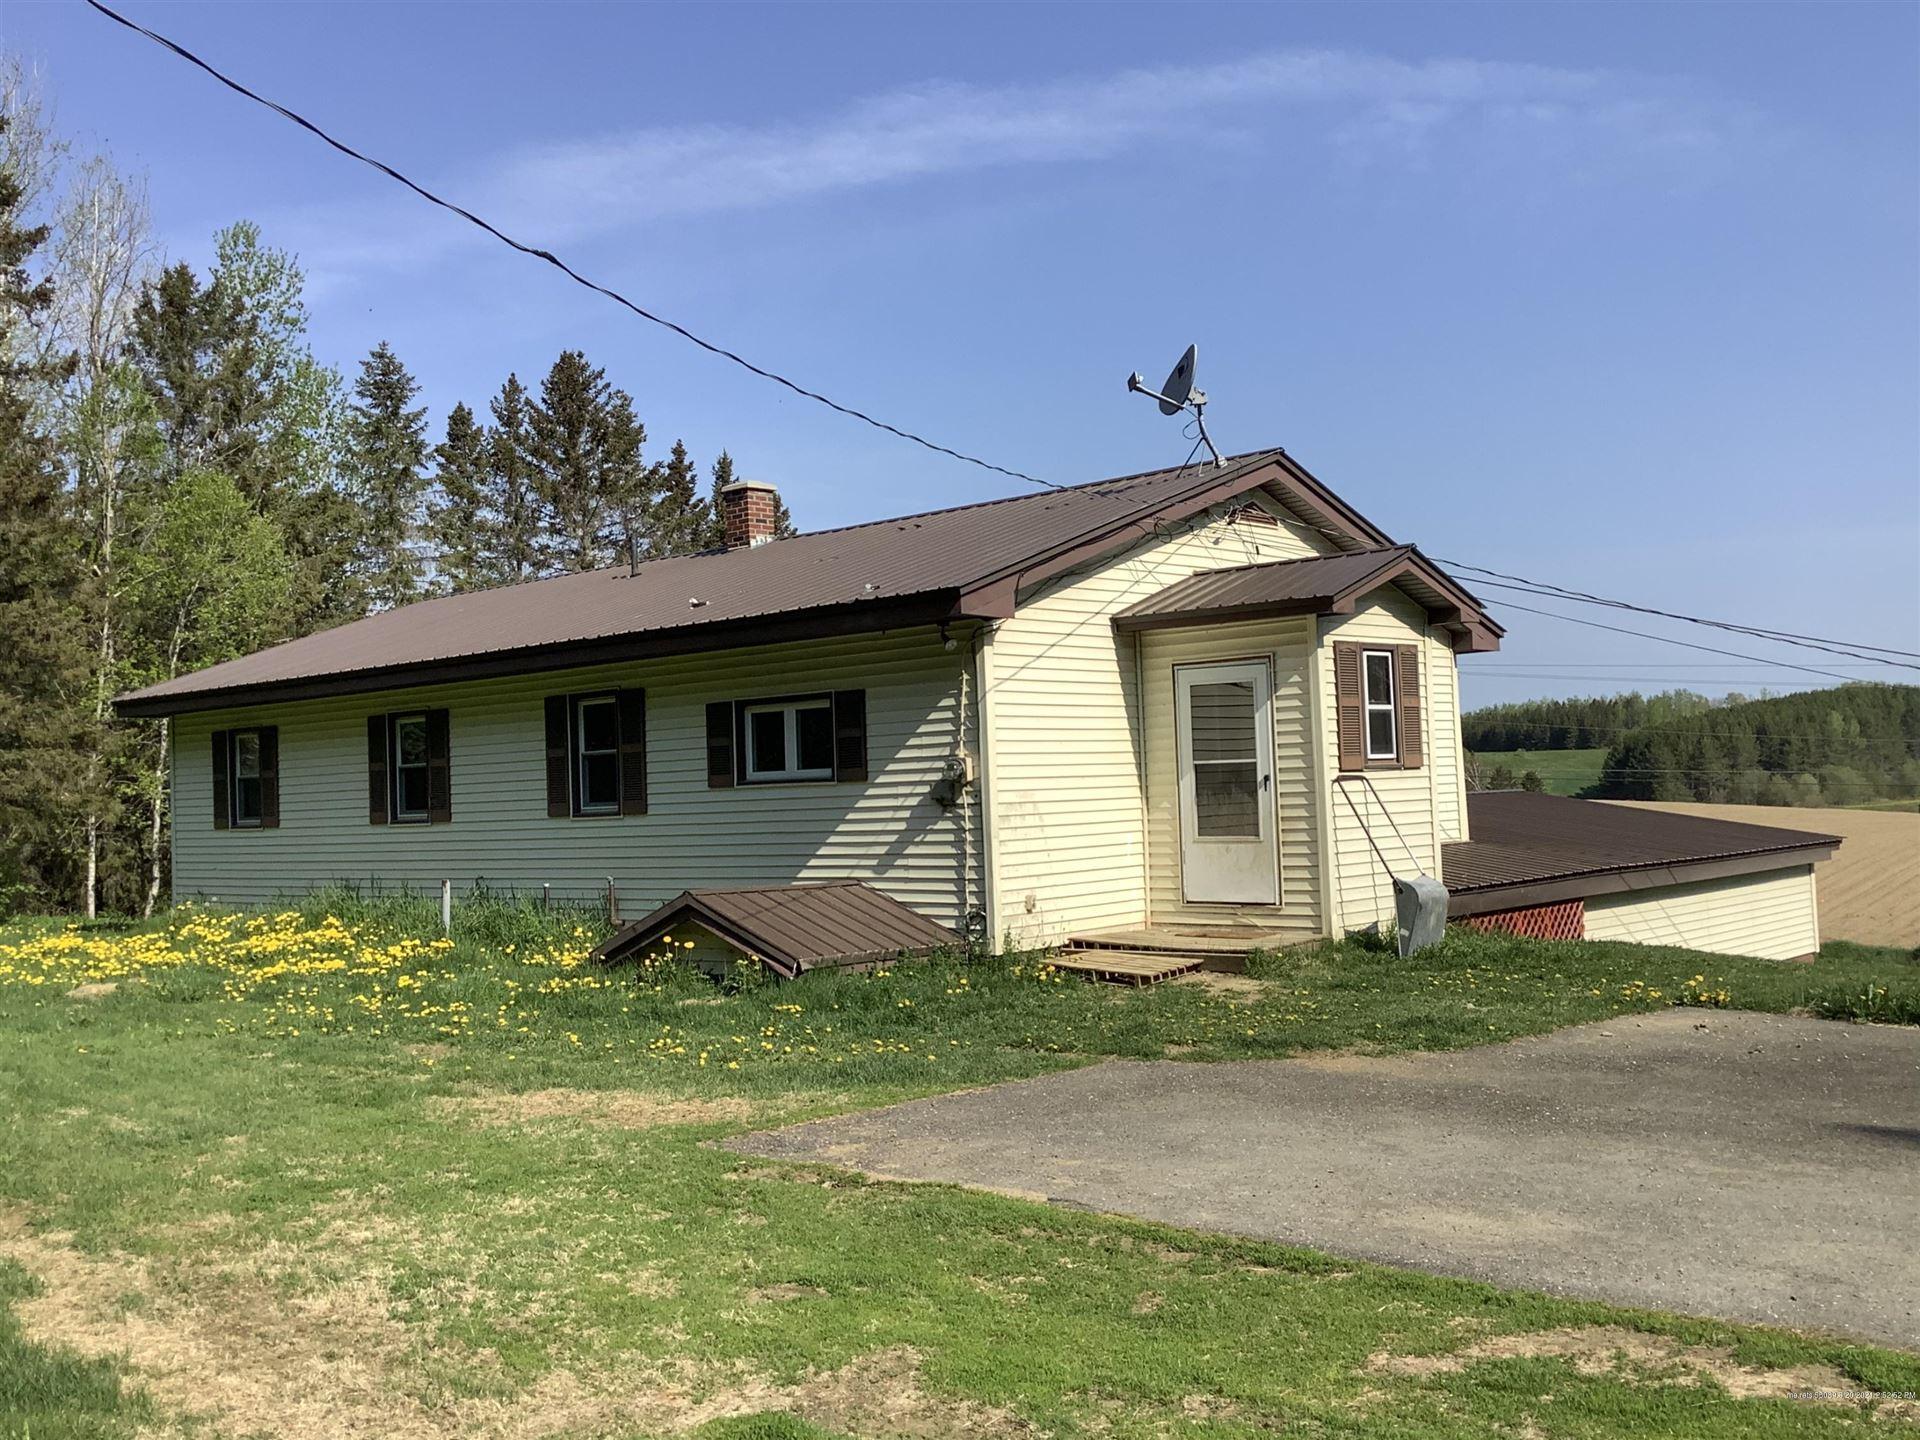 Photo of 40 Noyes Road, Limestone, ME 04750 (MLS # 1492423)